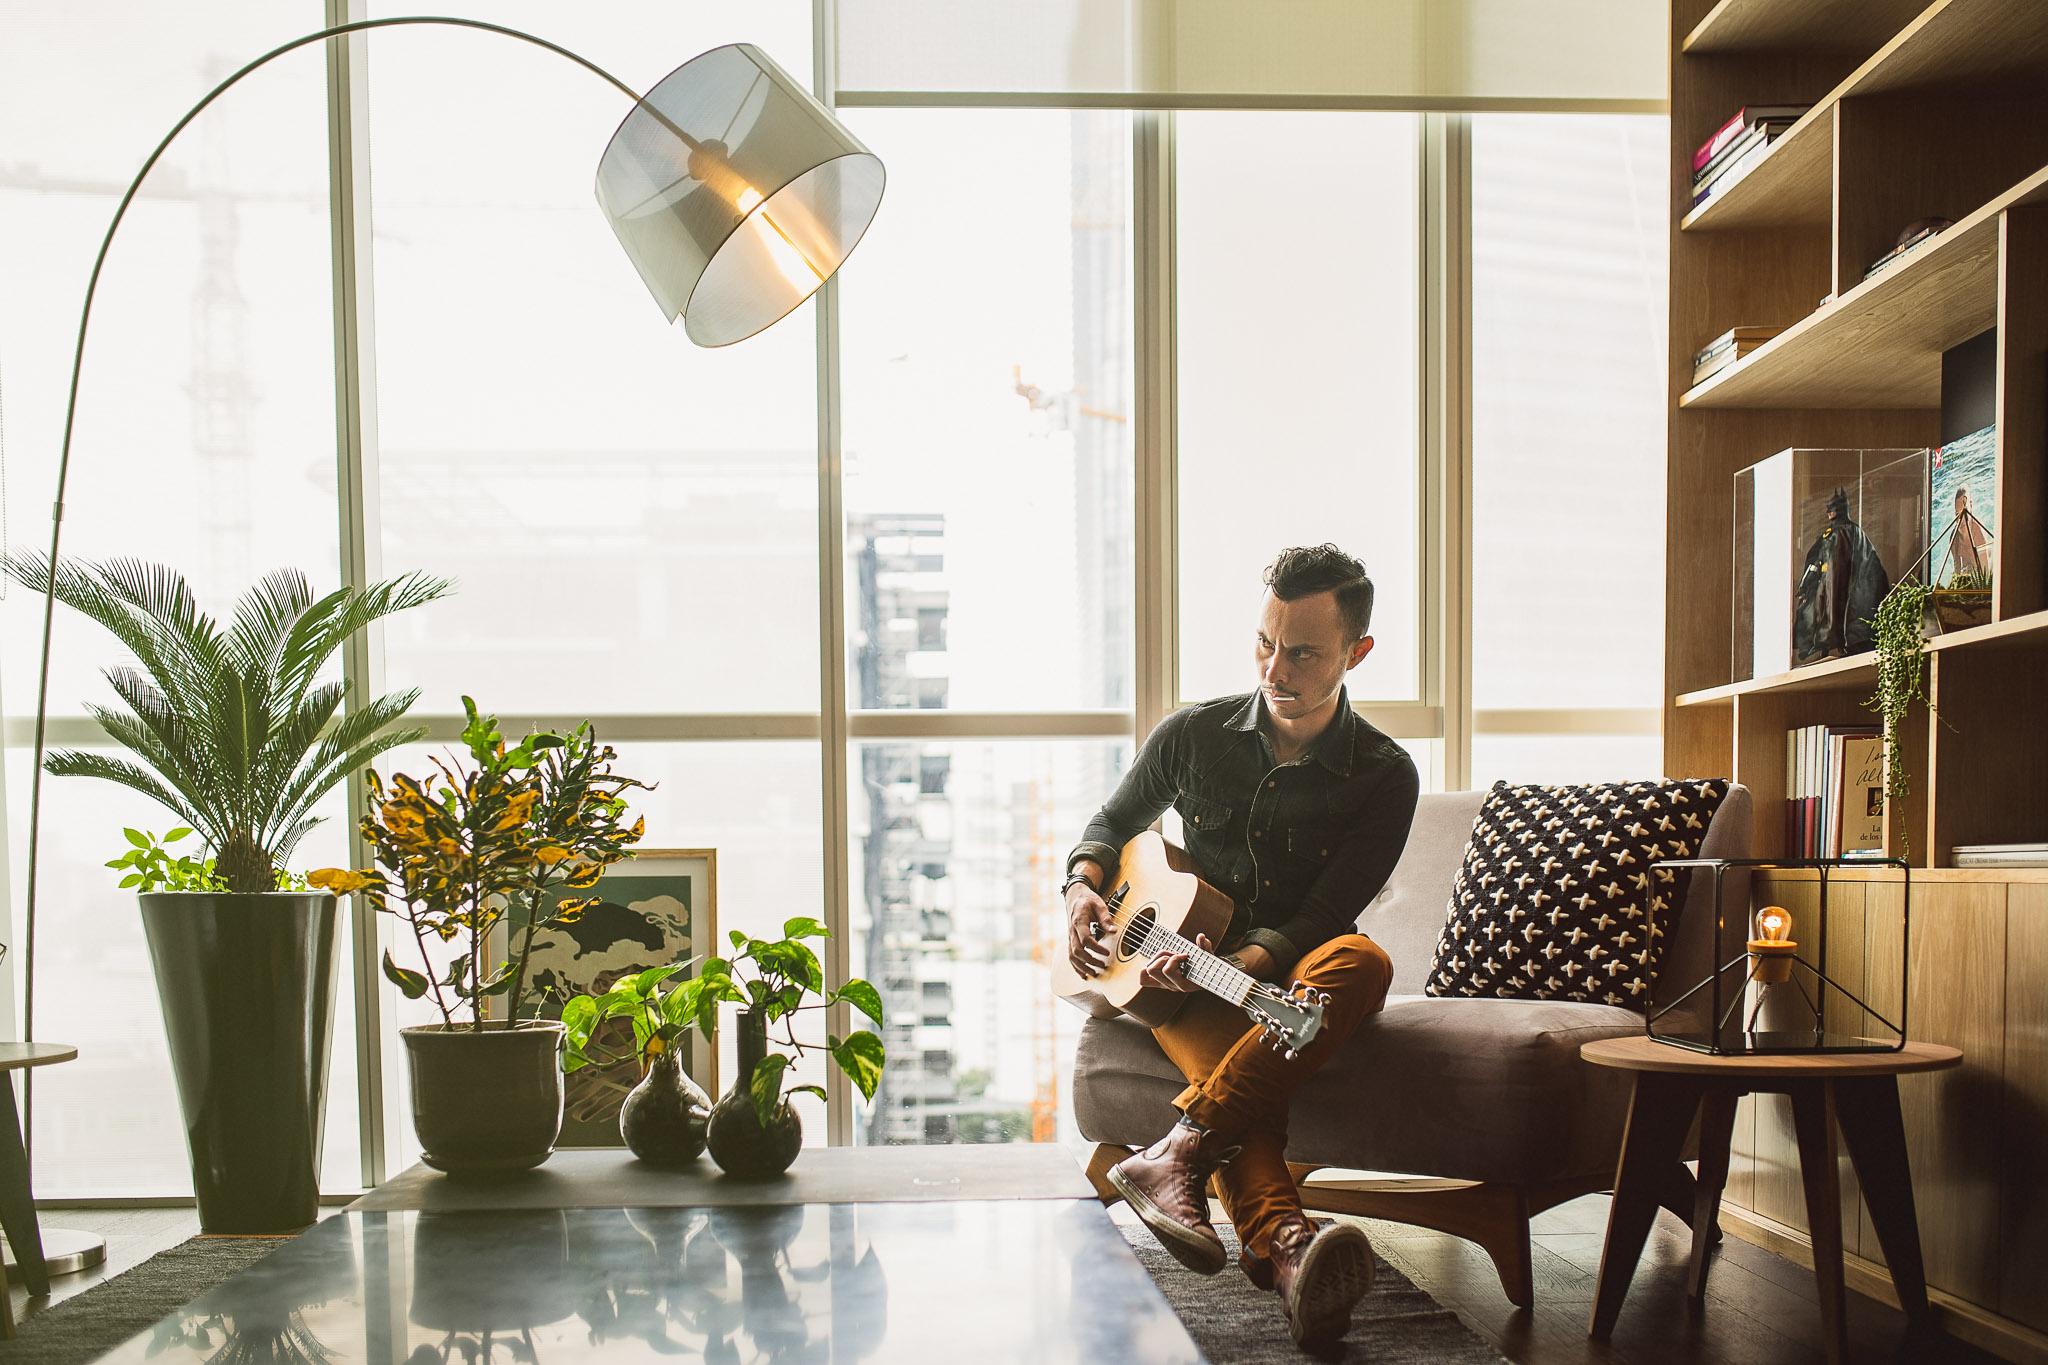 Taylor-guitar-advertising-portrait-brooks-hipster-fotografo-mexico-retrato-MaurizioSolisBroca.Photography150706DSC02901-Edit.jpg